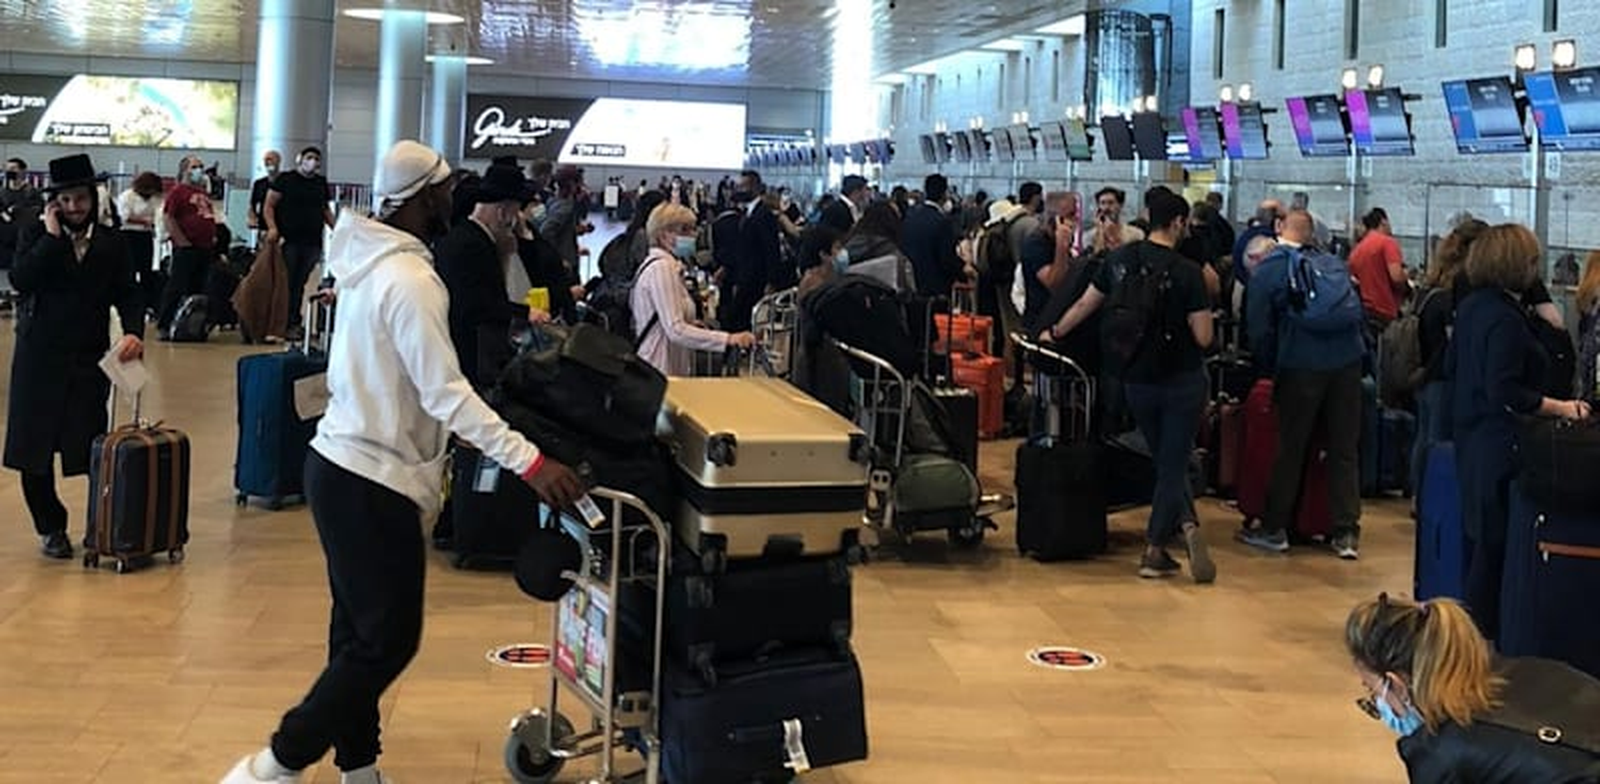 Passengers packed into Ben Gurion airport Photo: Michal Raz-Chaimovitz